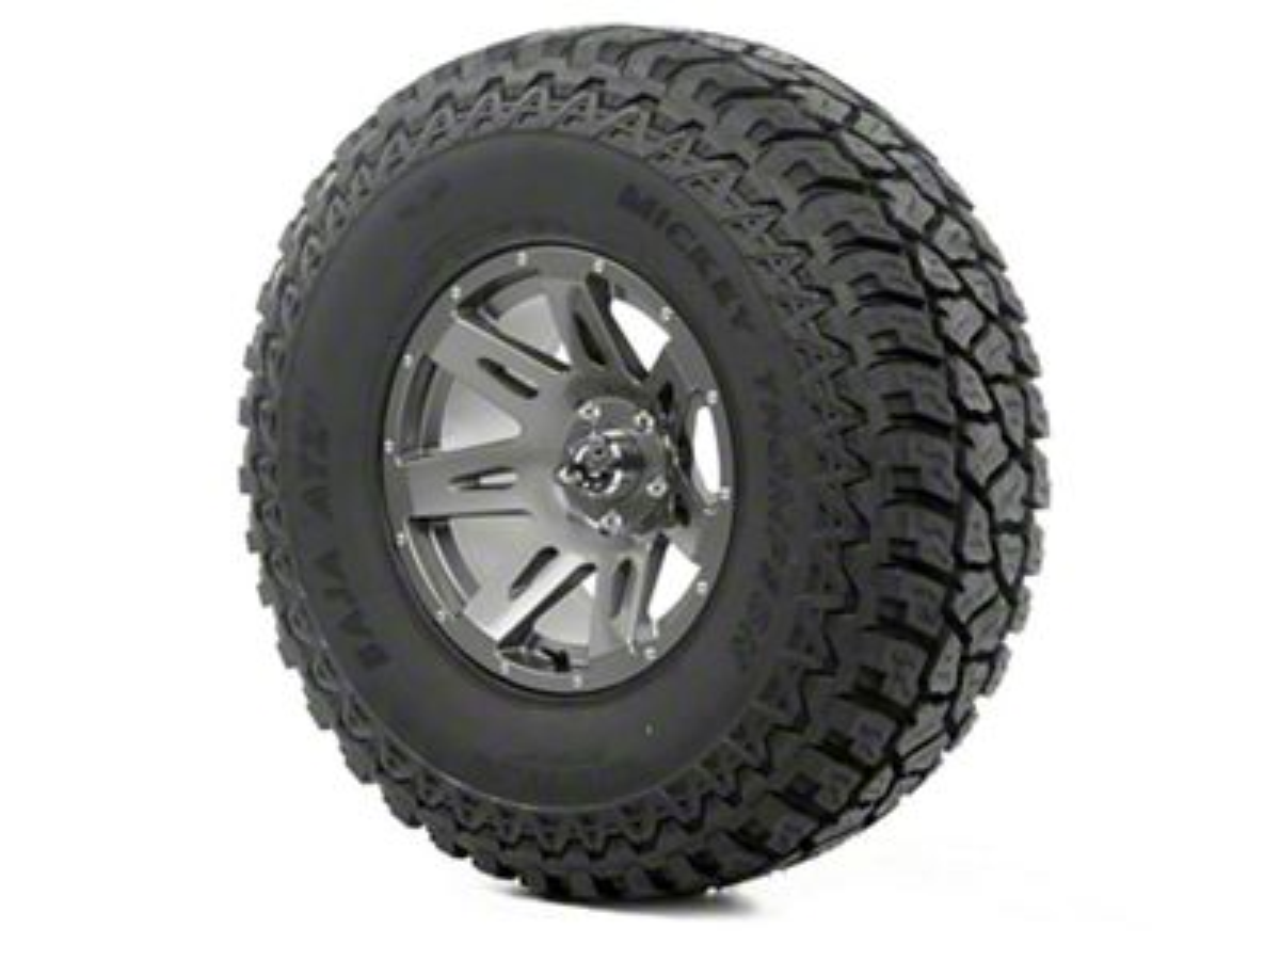 Rugged Ridge XHD Wheel 17x9 Gun Metal and Mickey Thompson ATZ P3 37x12.50x17 Tire (13-18 Jeep Wrangler JK; 2018 Jeep Wrangler JL)